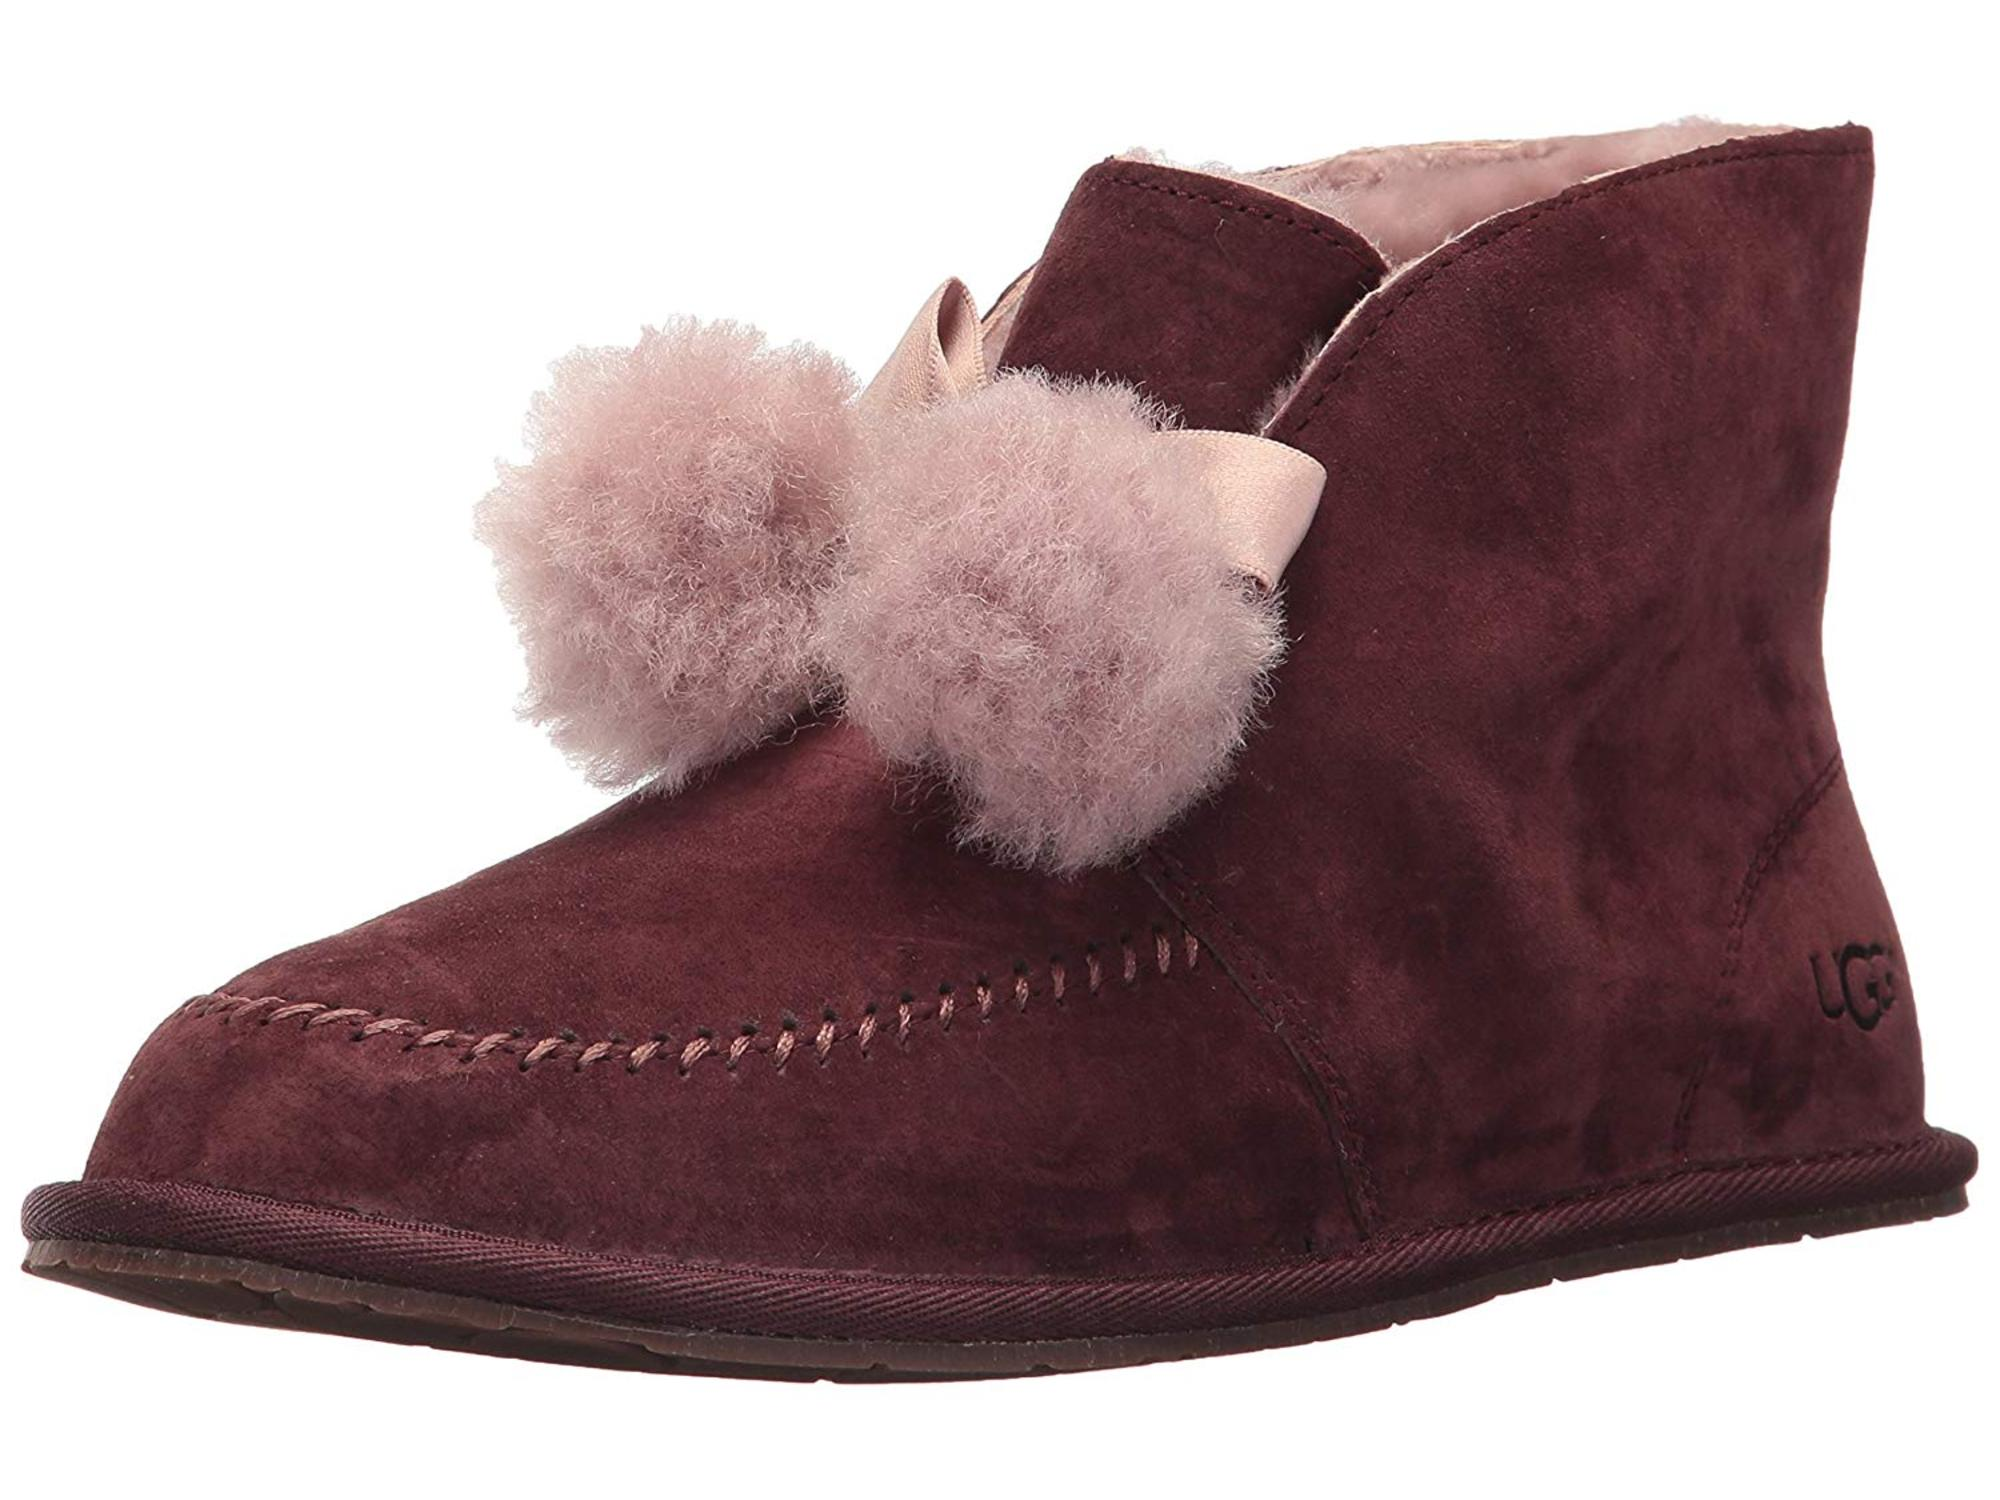 2546b15486f UGG Women's Kallen Slouch Boot, Cordovan, Size 12.0